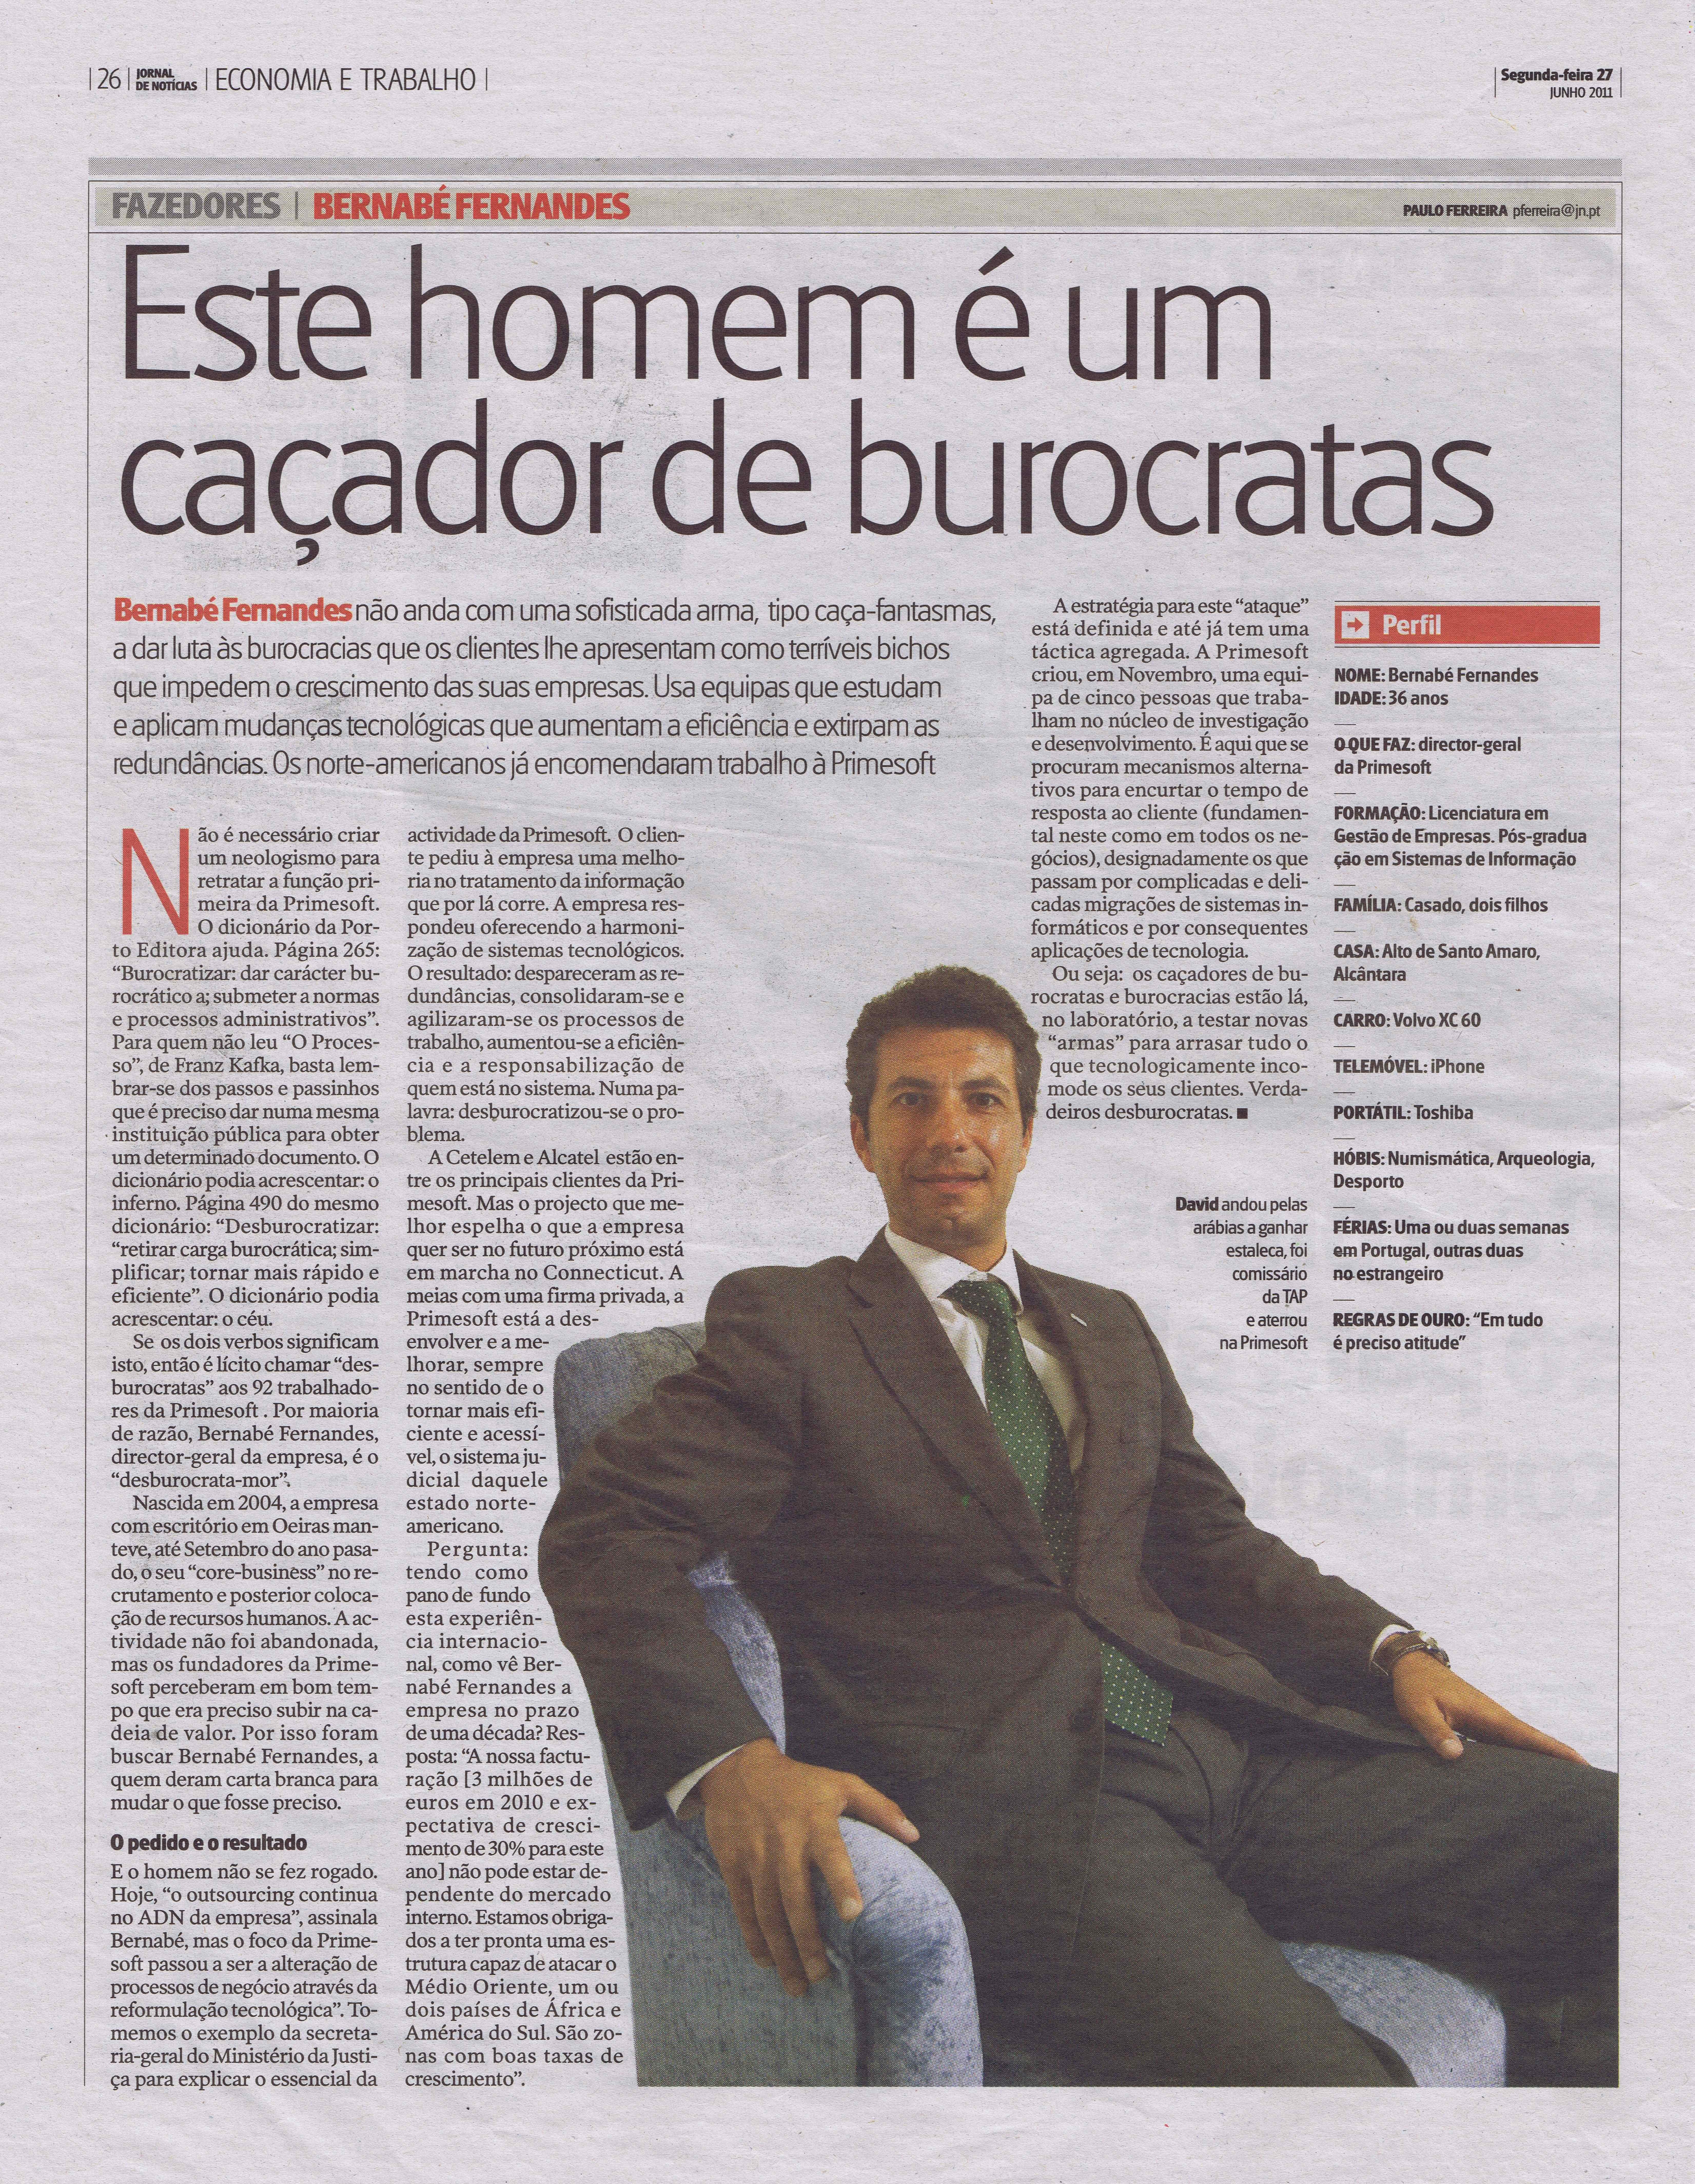 Jornal de Noticias - Primesoft - David Bernabé Fernandes.JPG